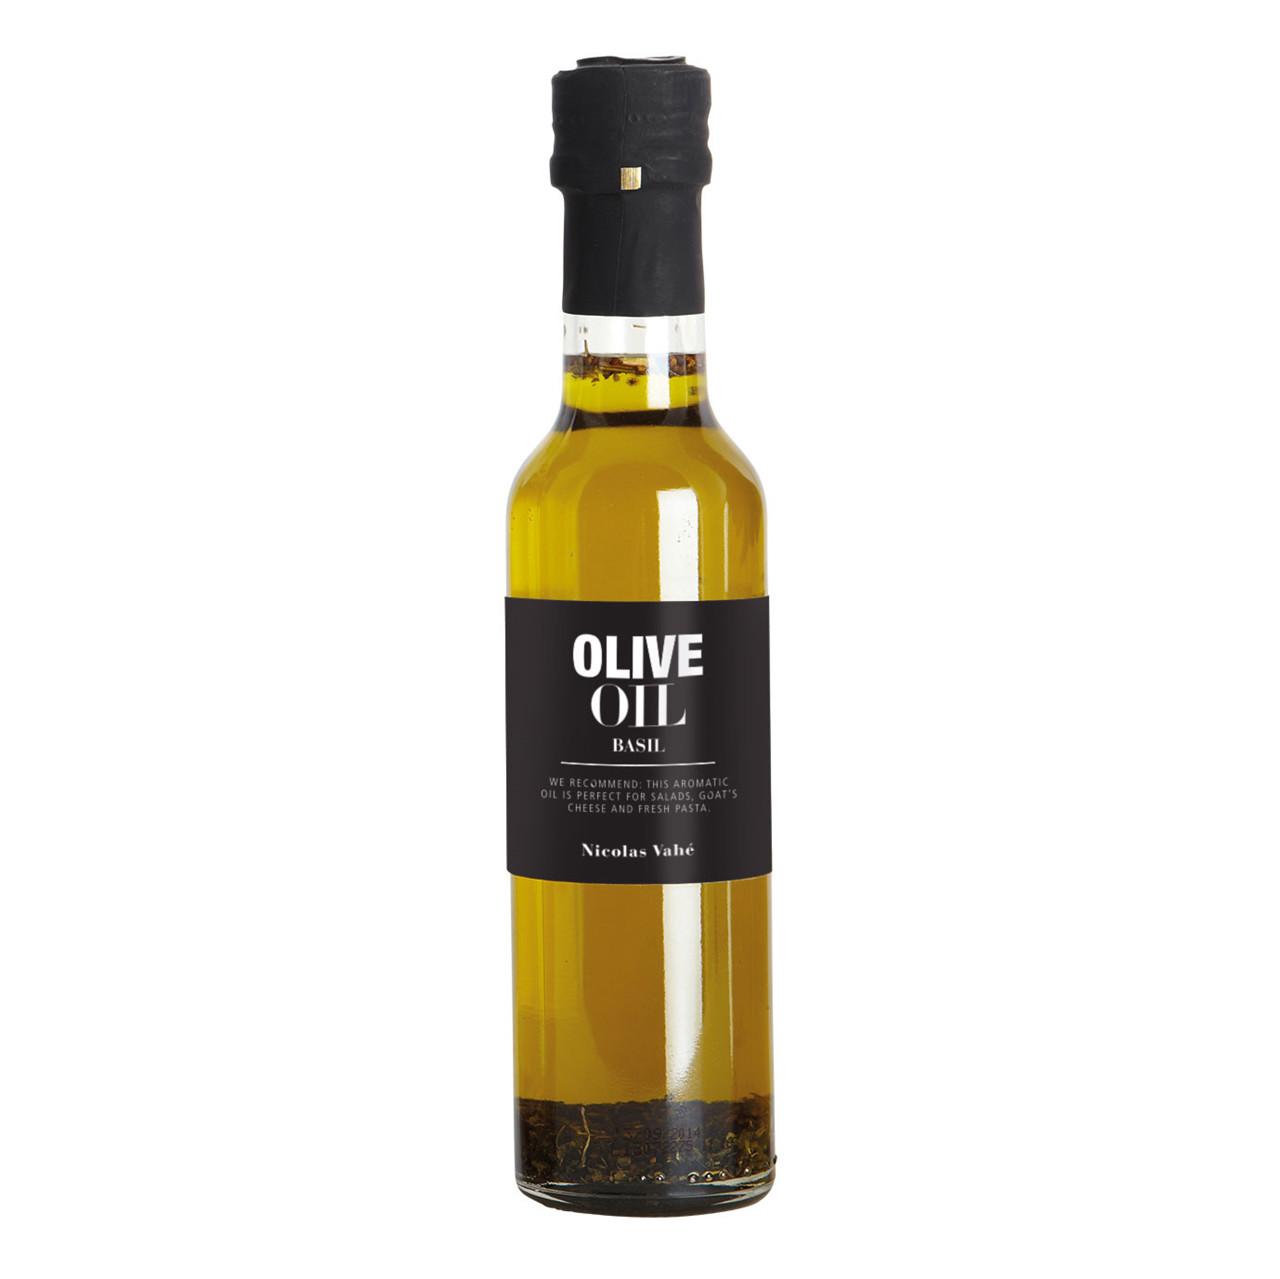 Nicolas vahé – Nicolas vahé olivenolie med basilikum fra livingshop